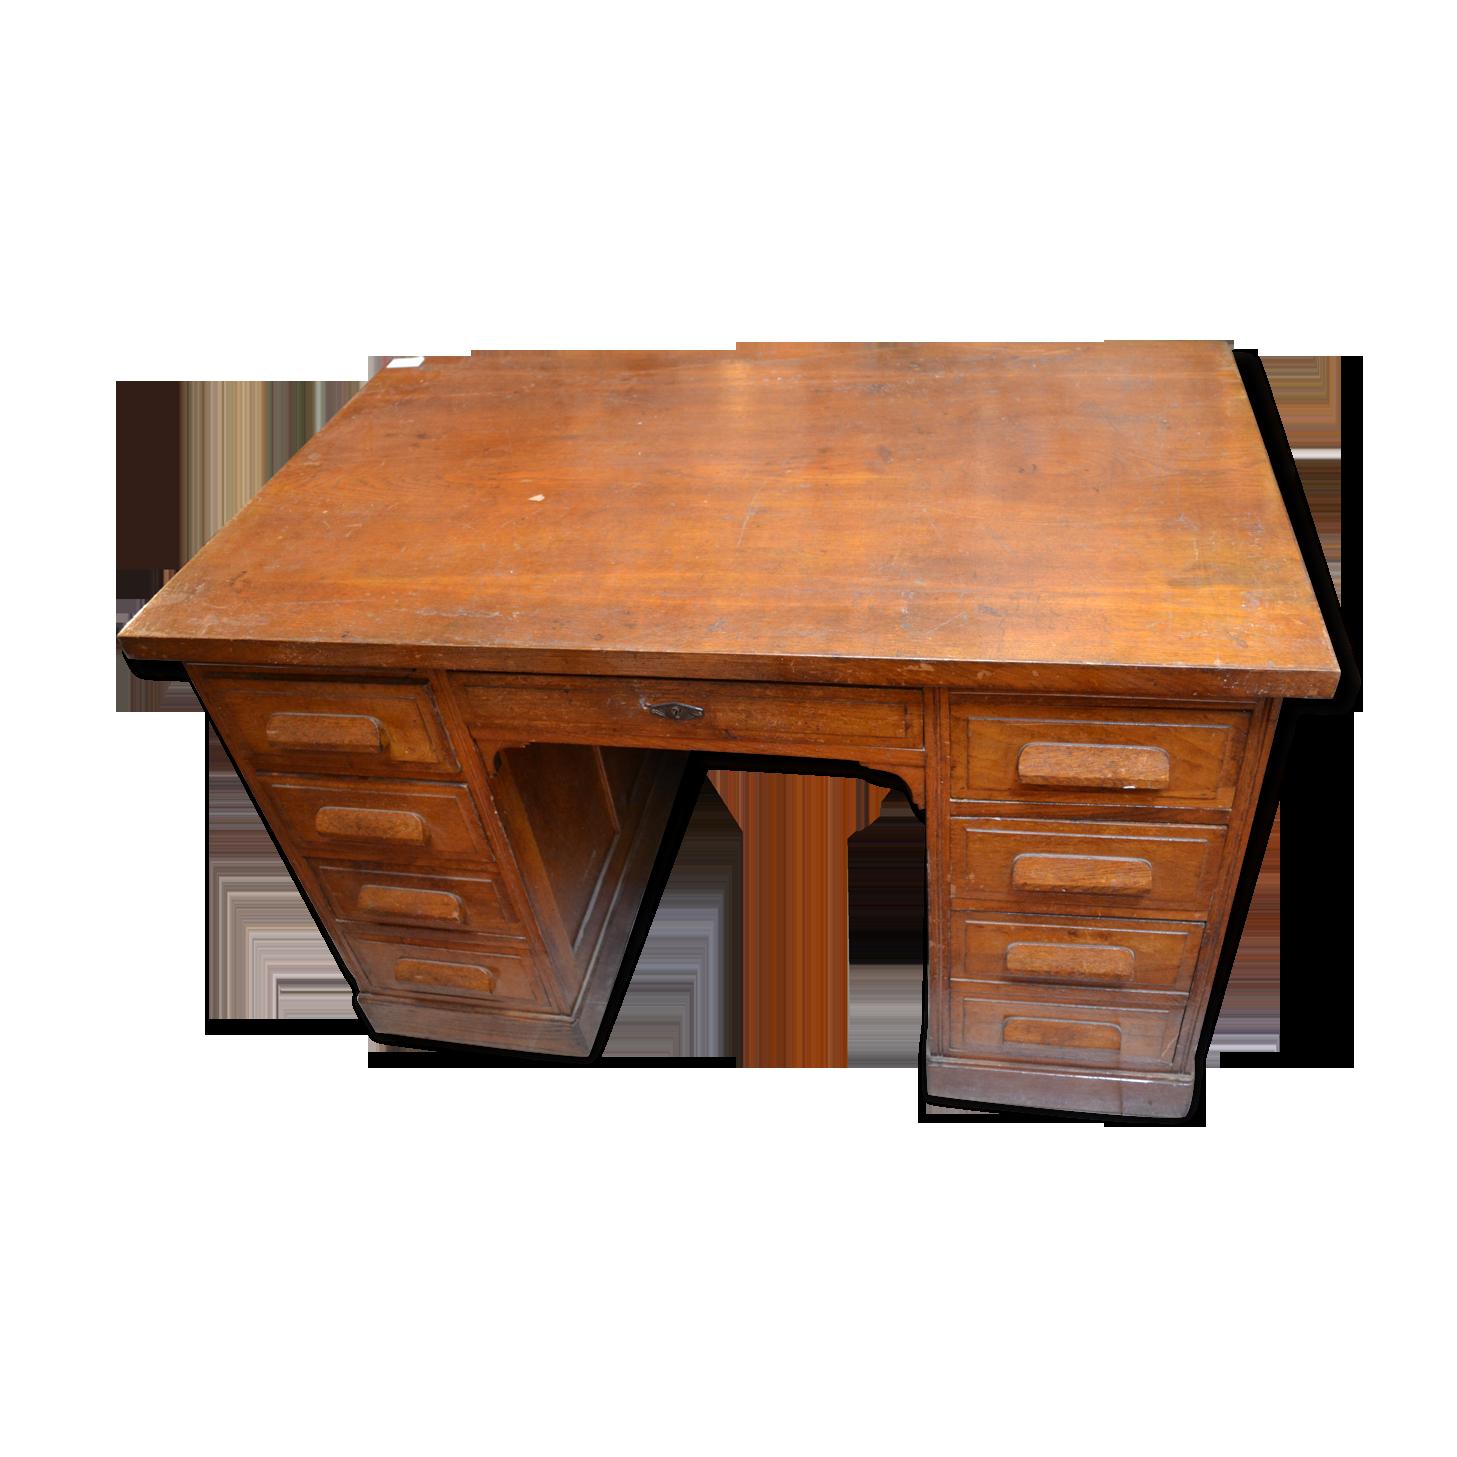 Bureau administratif chêne bois matériau marron vintage